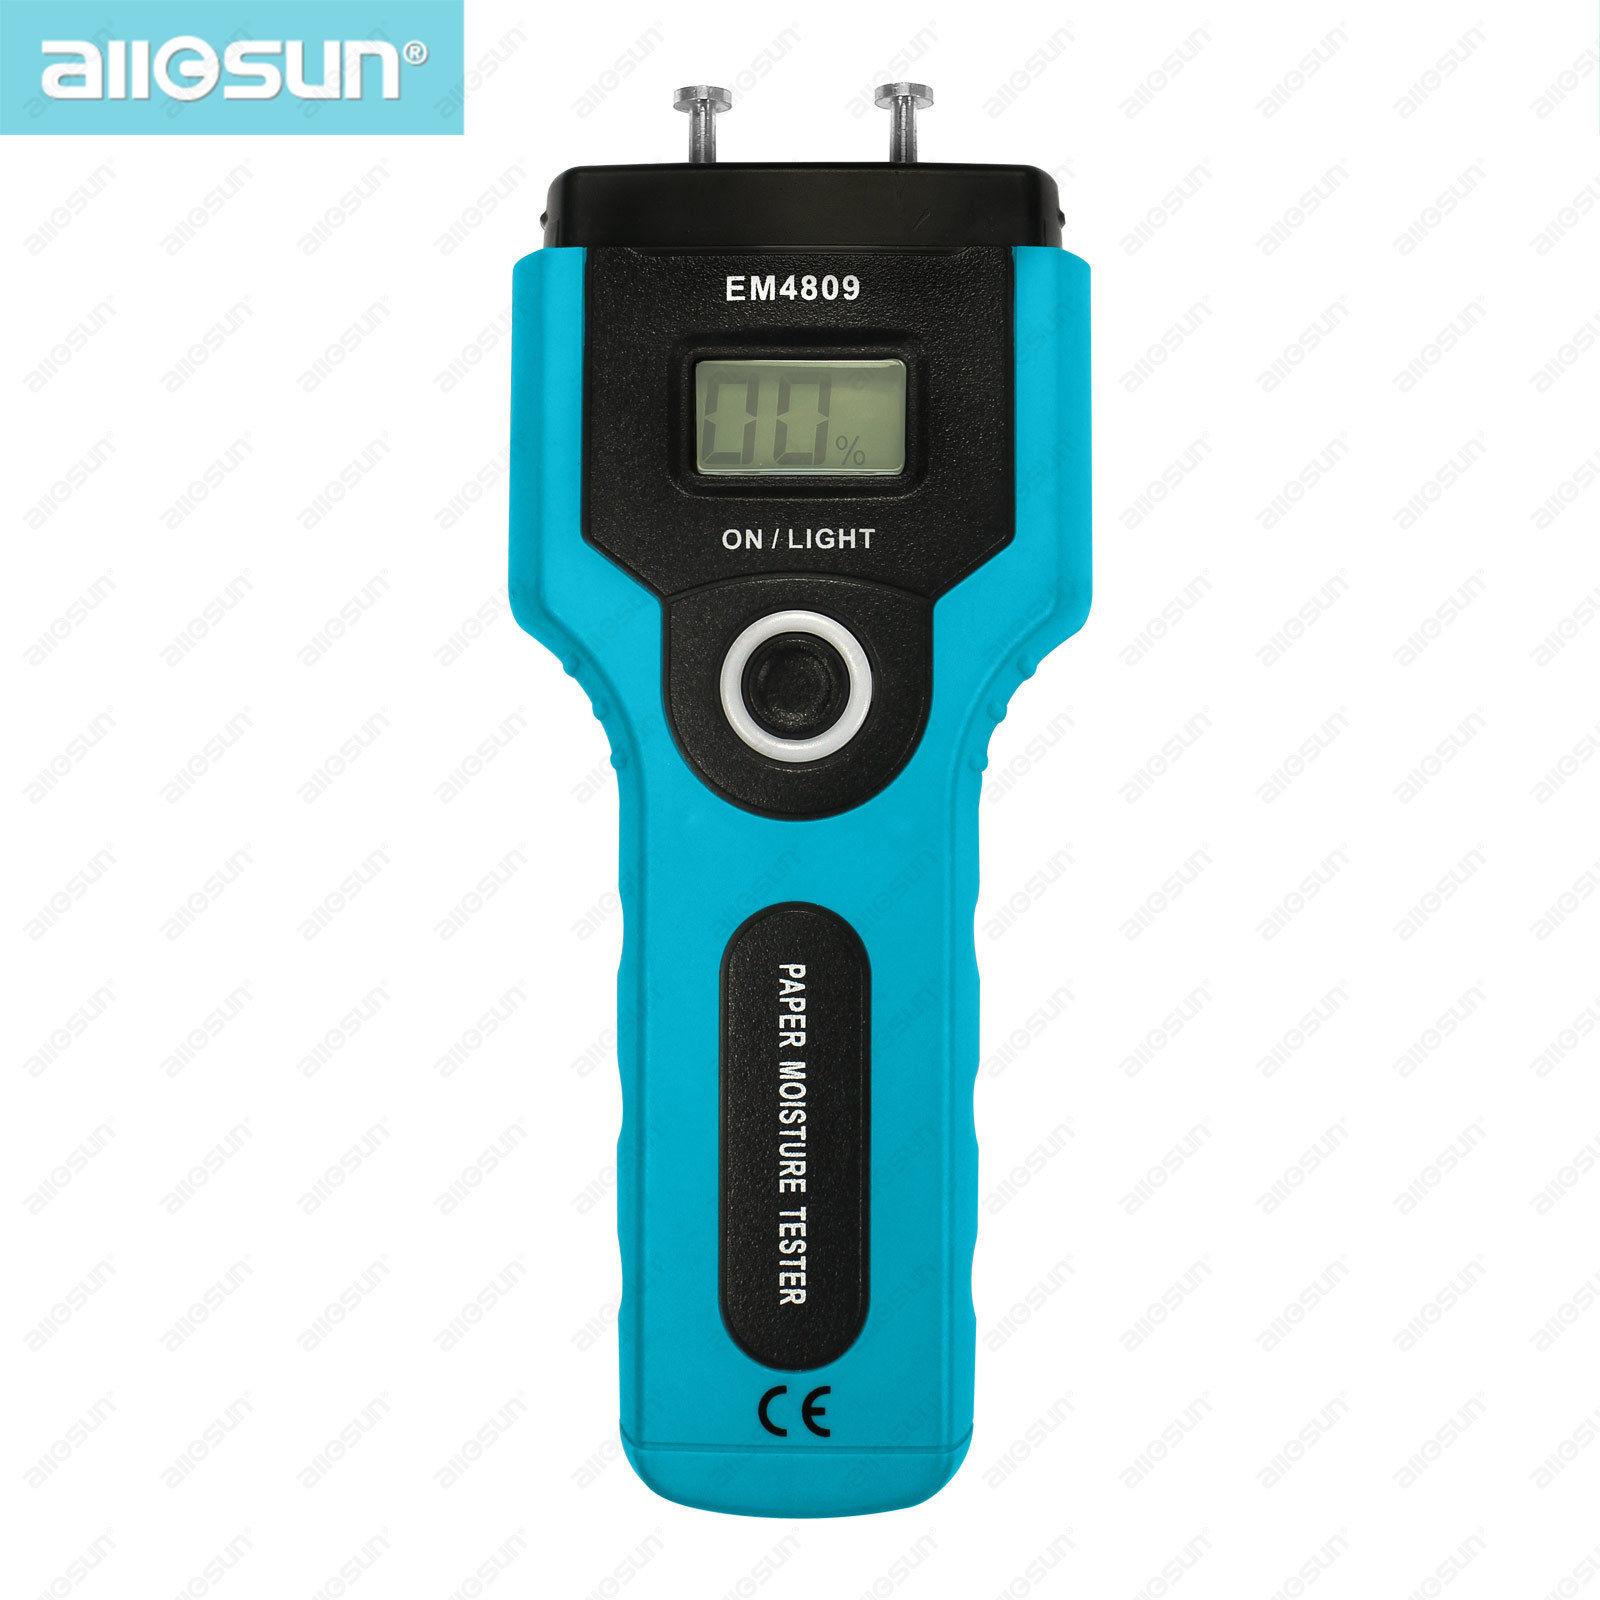 all-sun EM4809 Stable Paper Moisture Meter Non-destructive Probe Paper Hygrometer Practical Moisture Tester